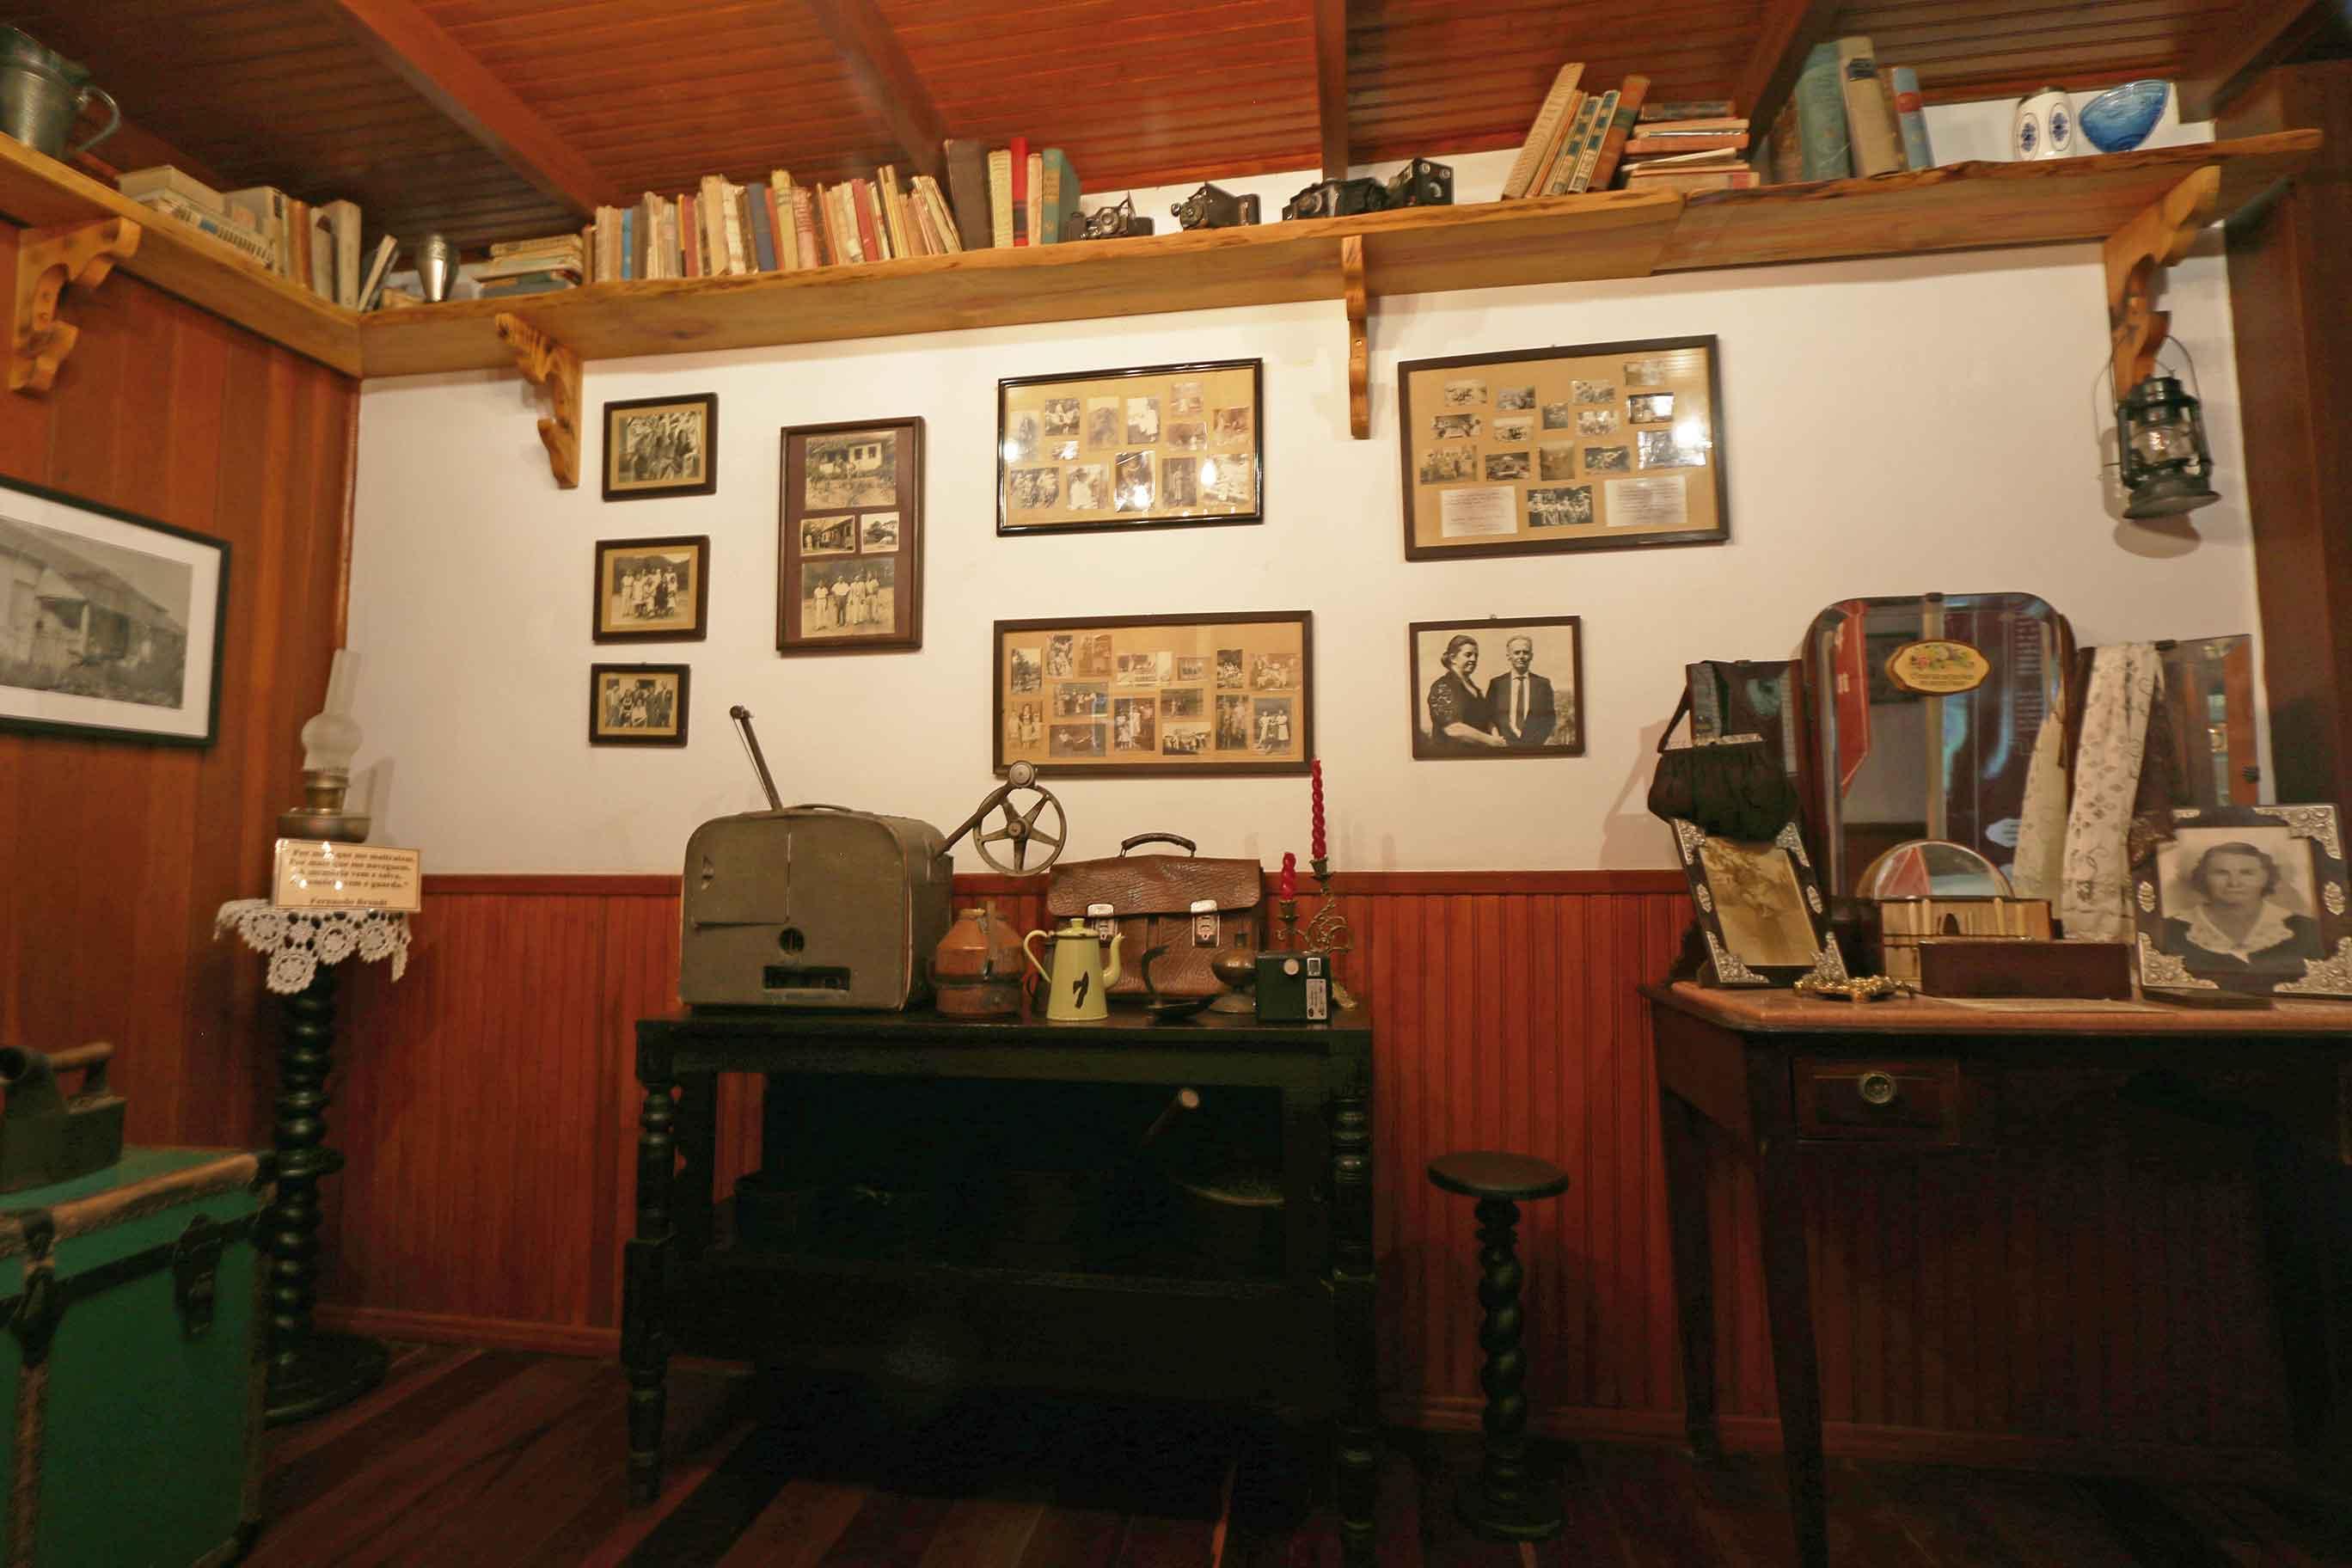 visconde-de-maua-cultura-museu-hotel-bulher-IMG_9897-bx